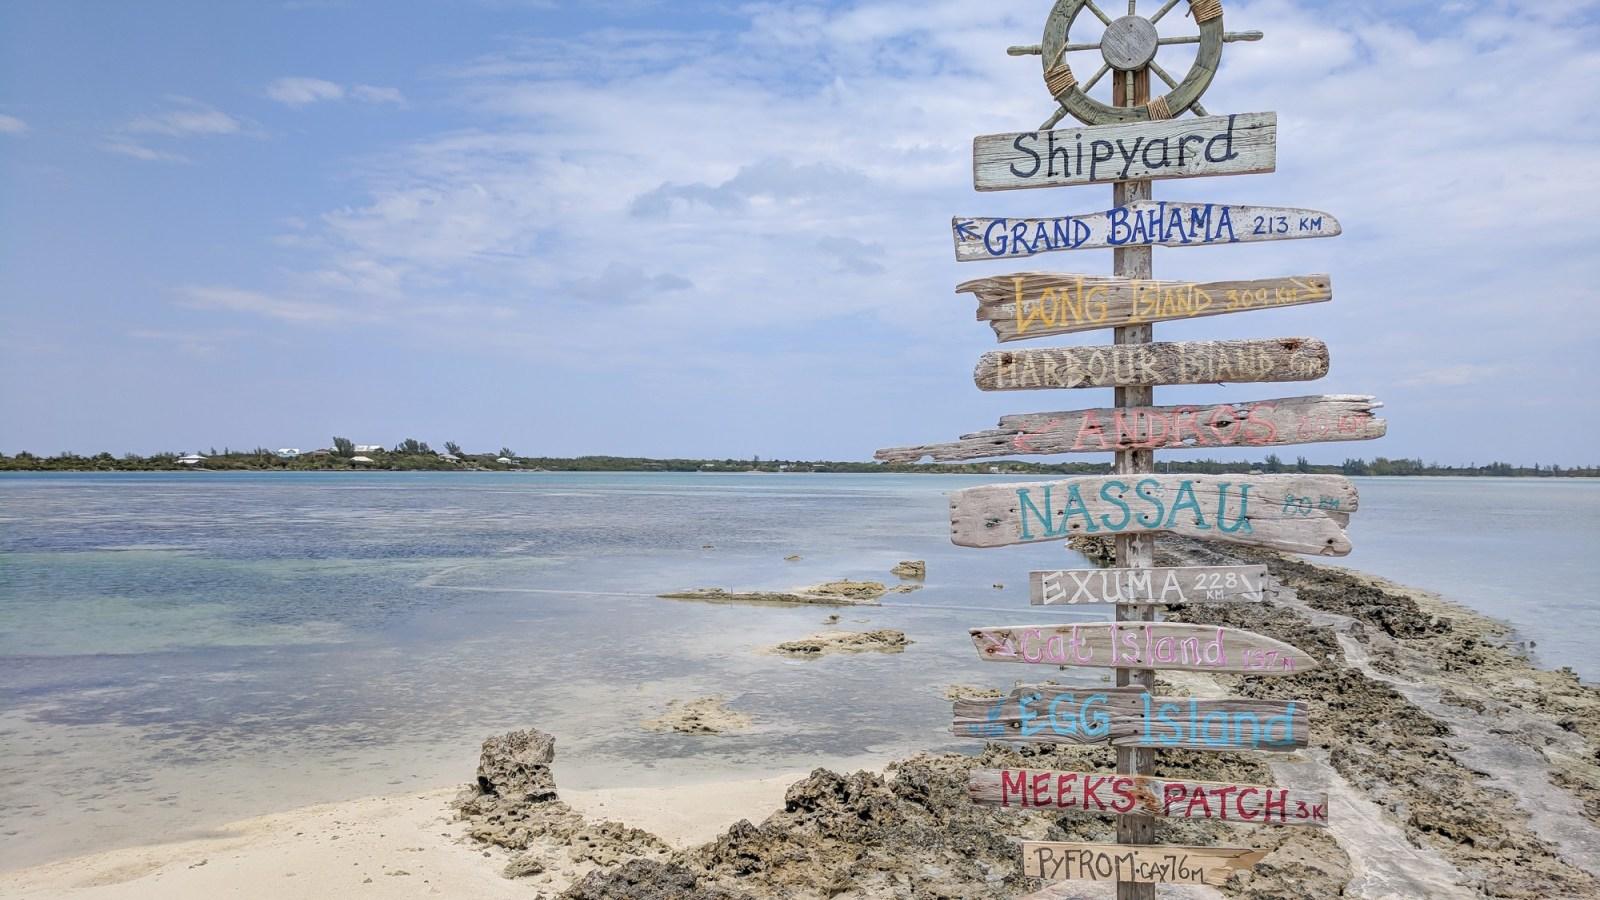 alternative sailing destinations after hurricane dorian